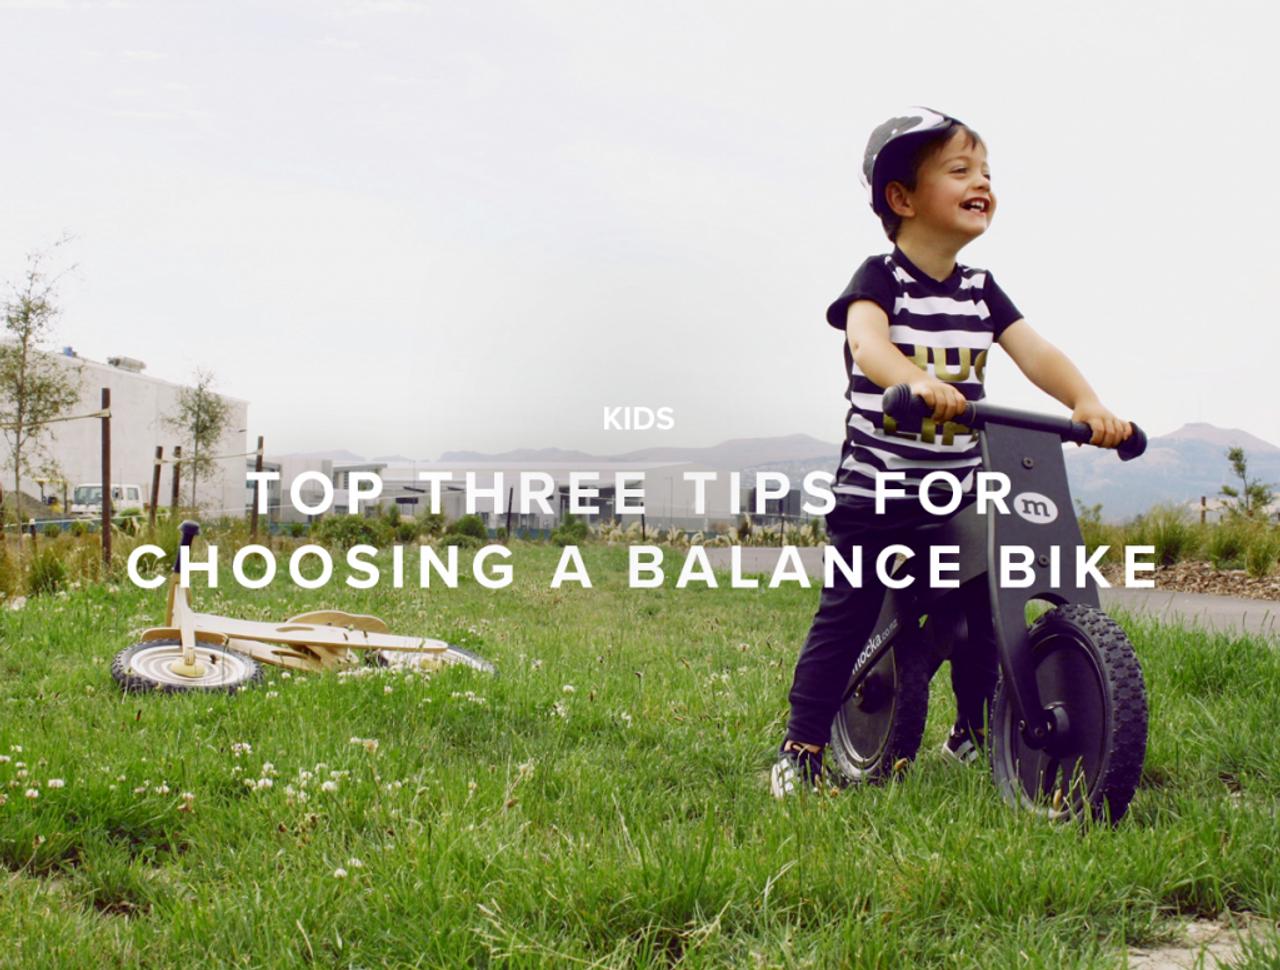 Top Three Tips For Choosing a Balance Bike